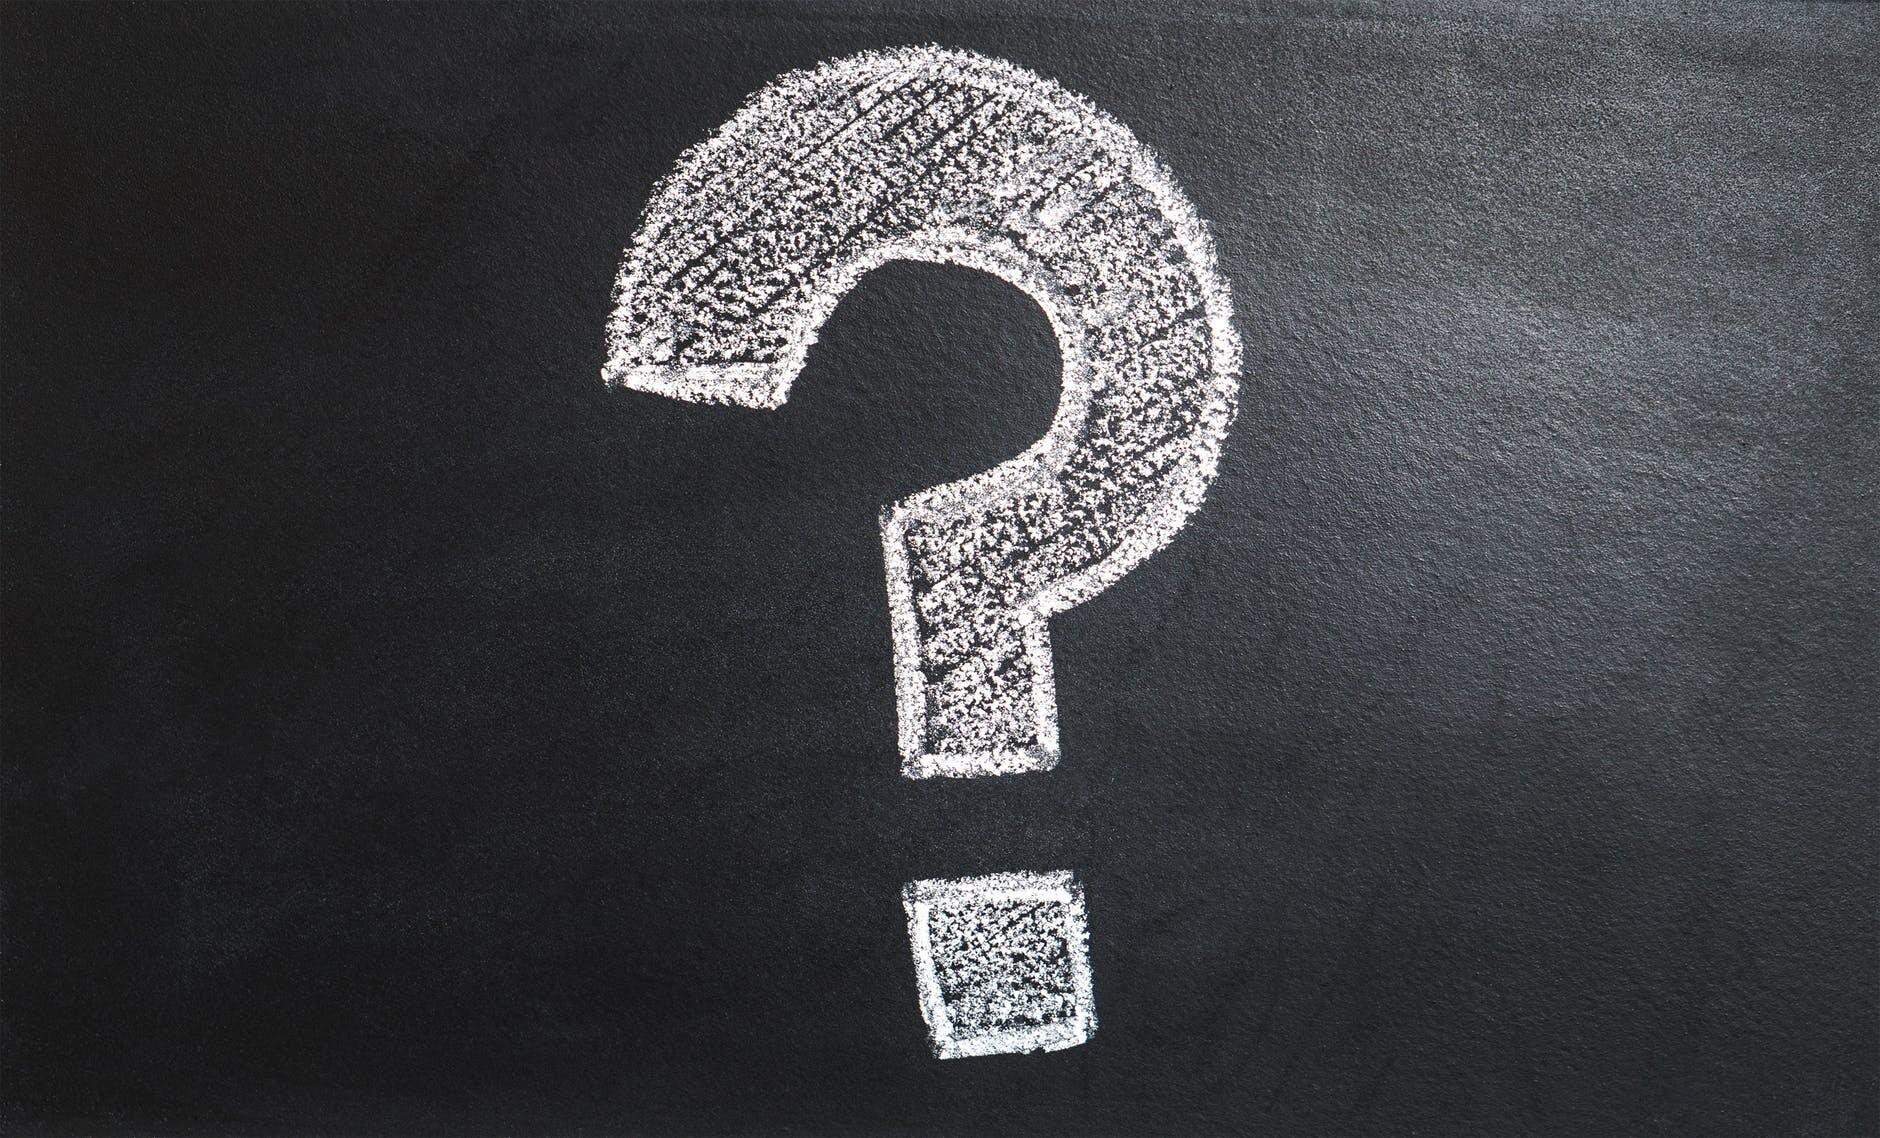 question mark illustration